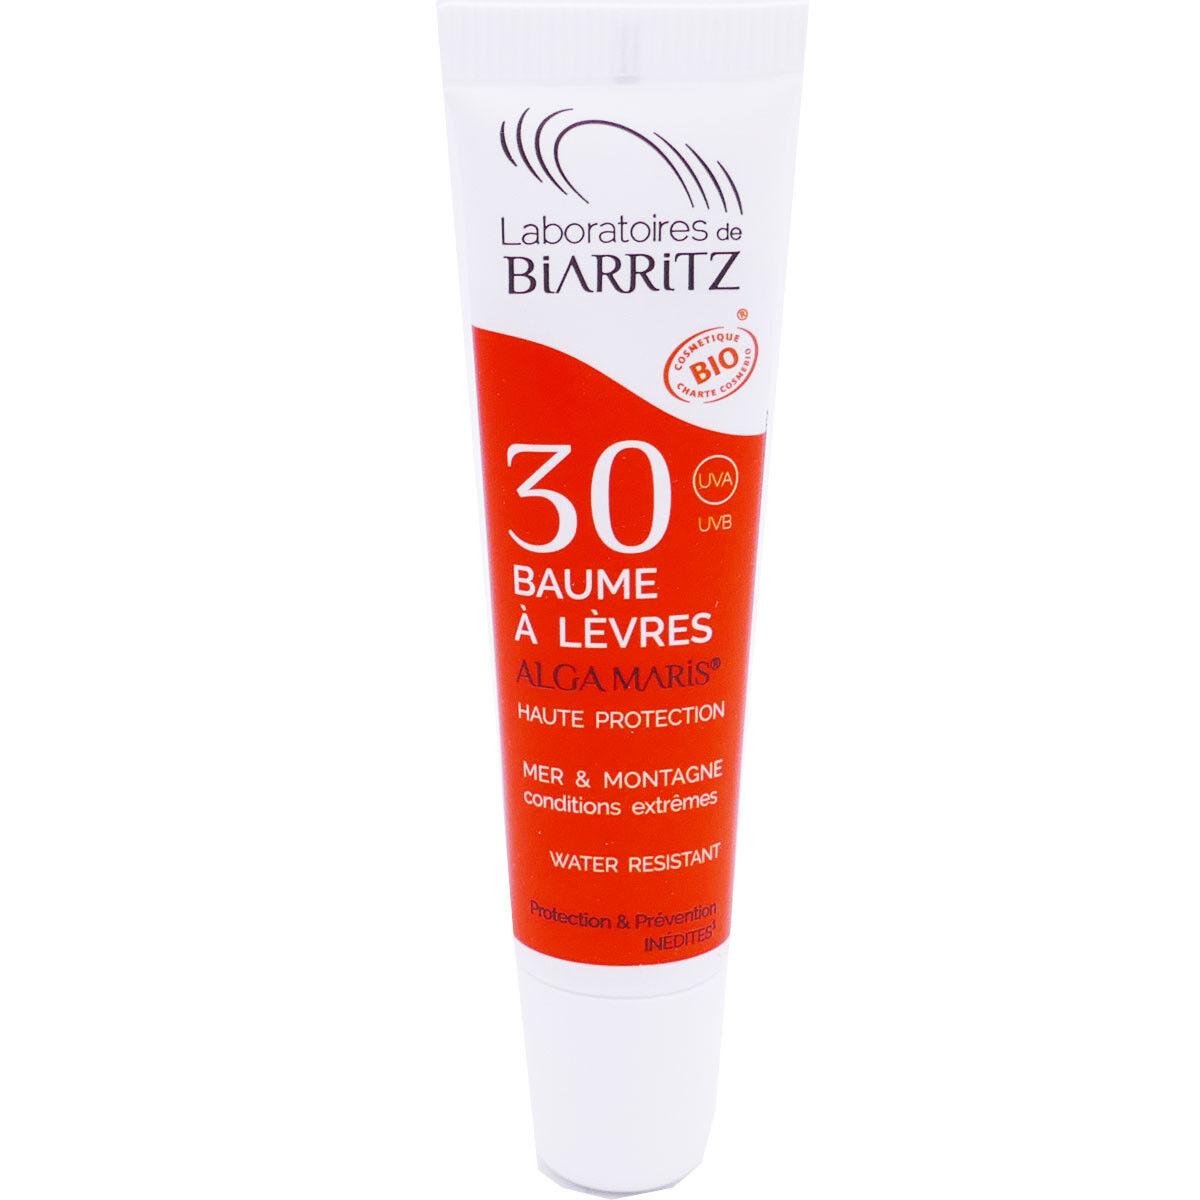 Biarritz baume a levres 30 alga maris 15ml bio